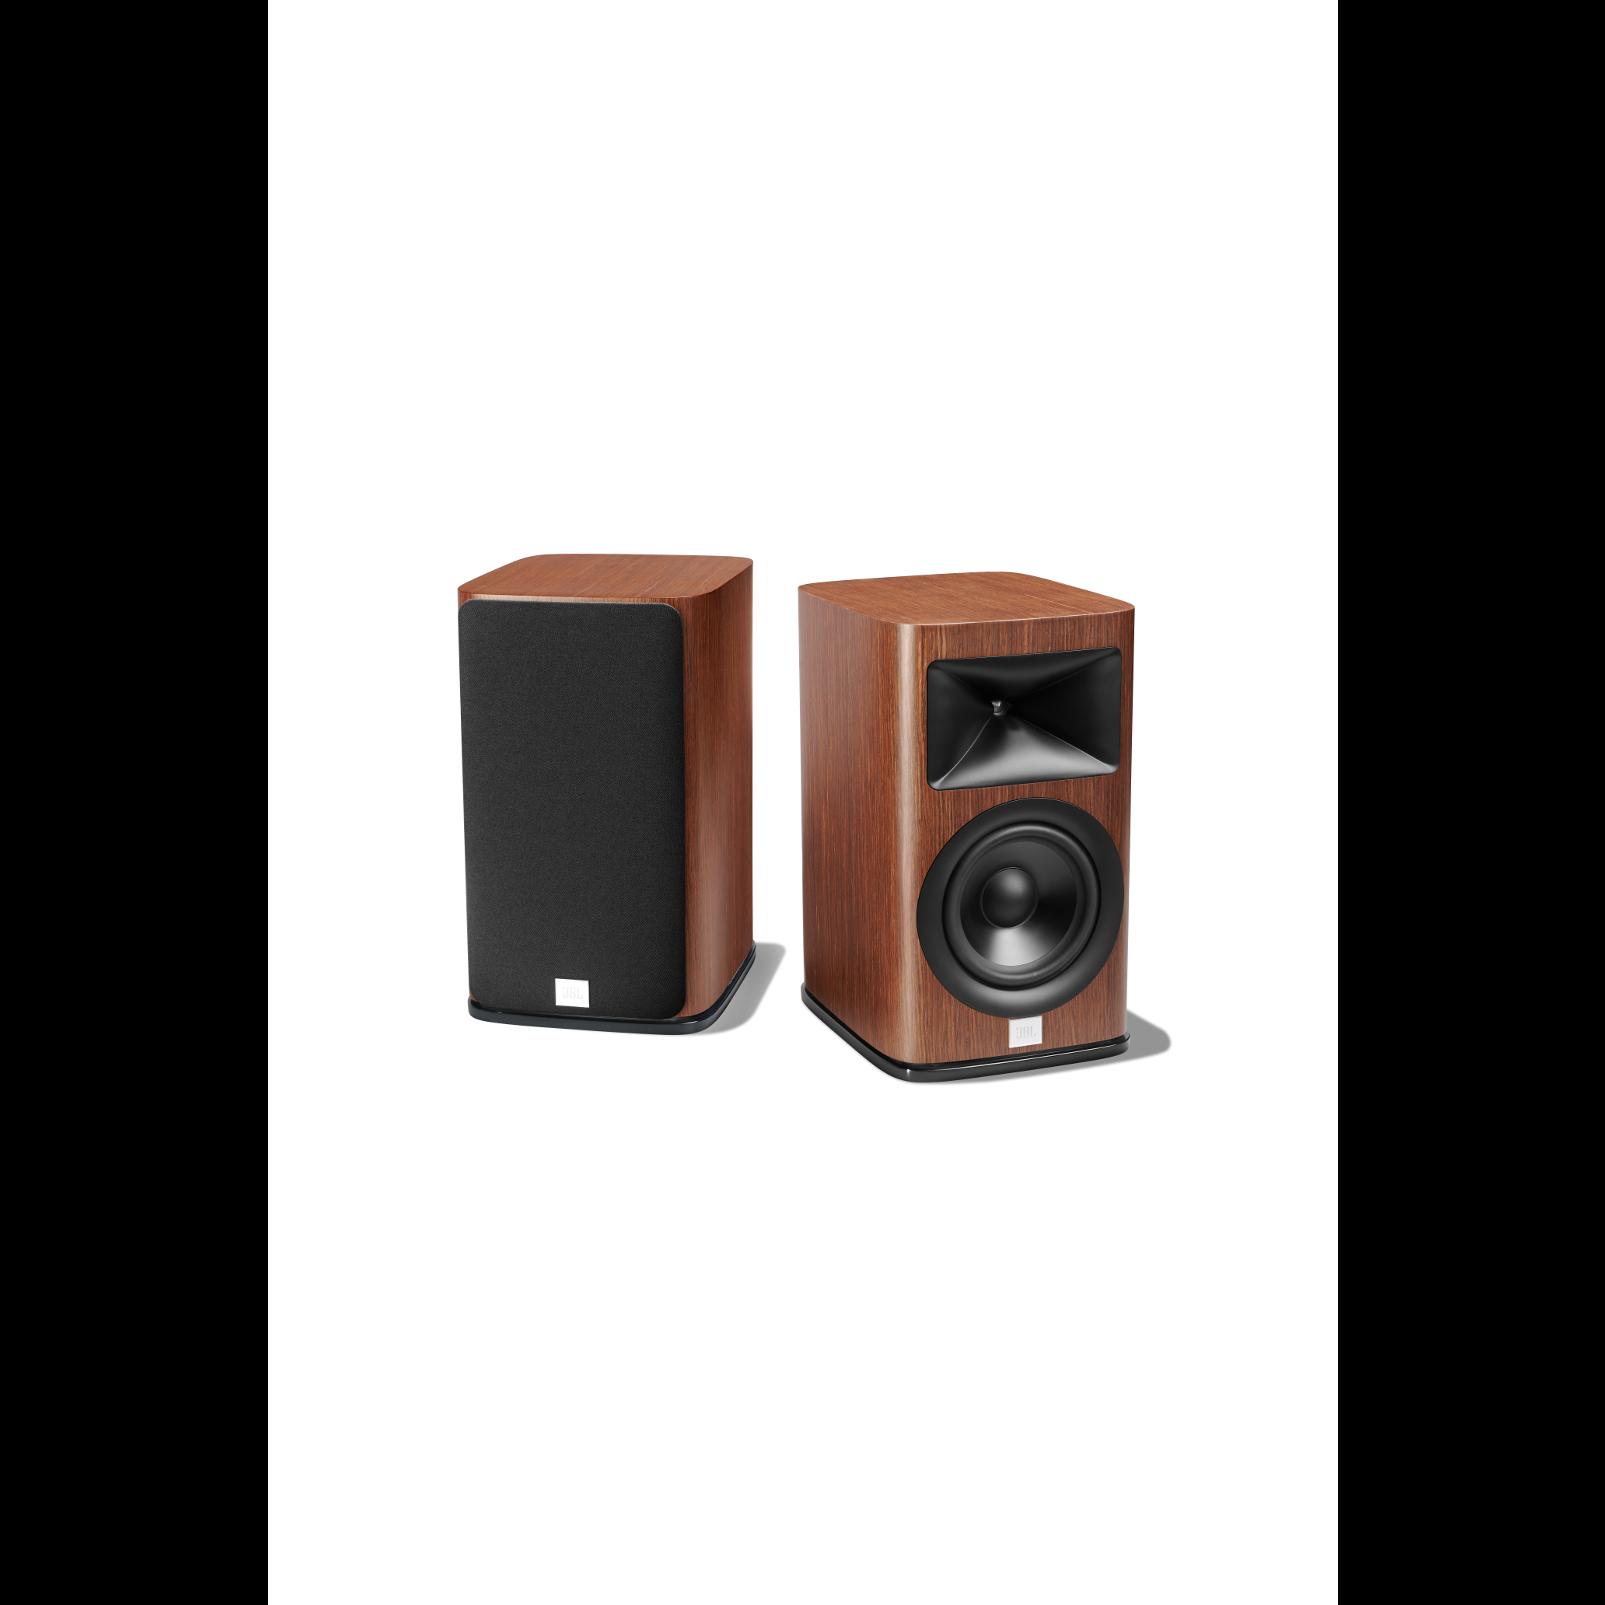 HDI-1600 - Walnut - 2-way 6.5-inch (165mm) Bookshelf Loudspeaker - Detailshot 1